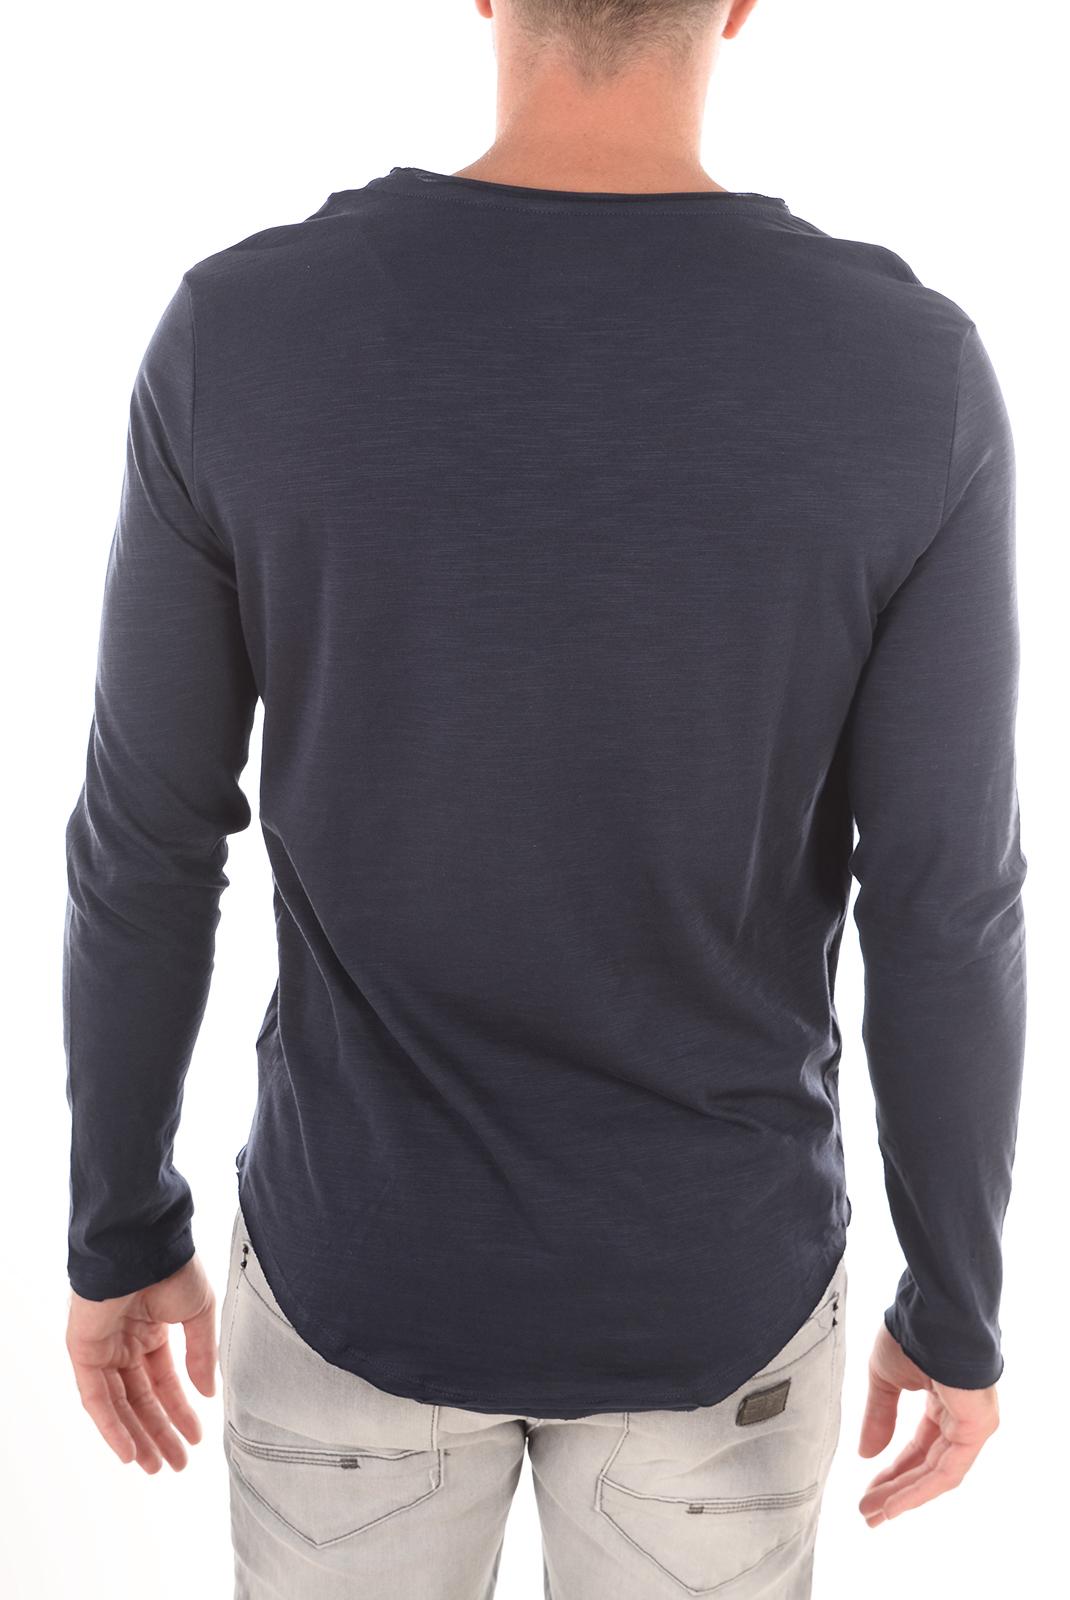 Tee-shirts  Guess jeans M63P49K4NV0 G720 BLEU